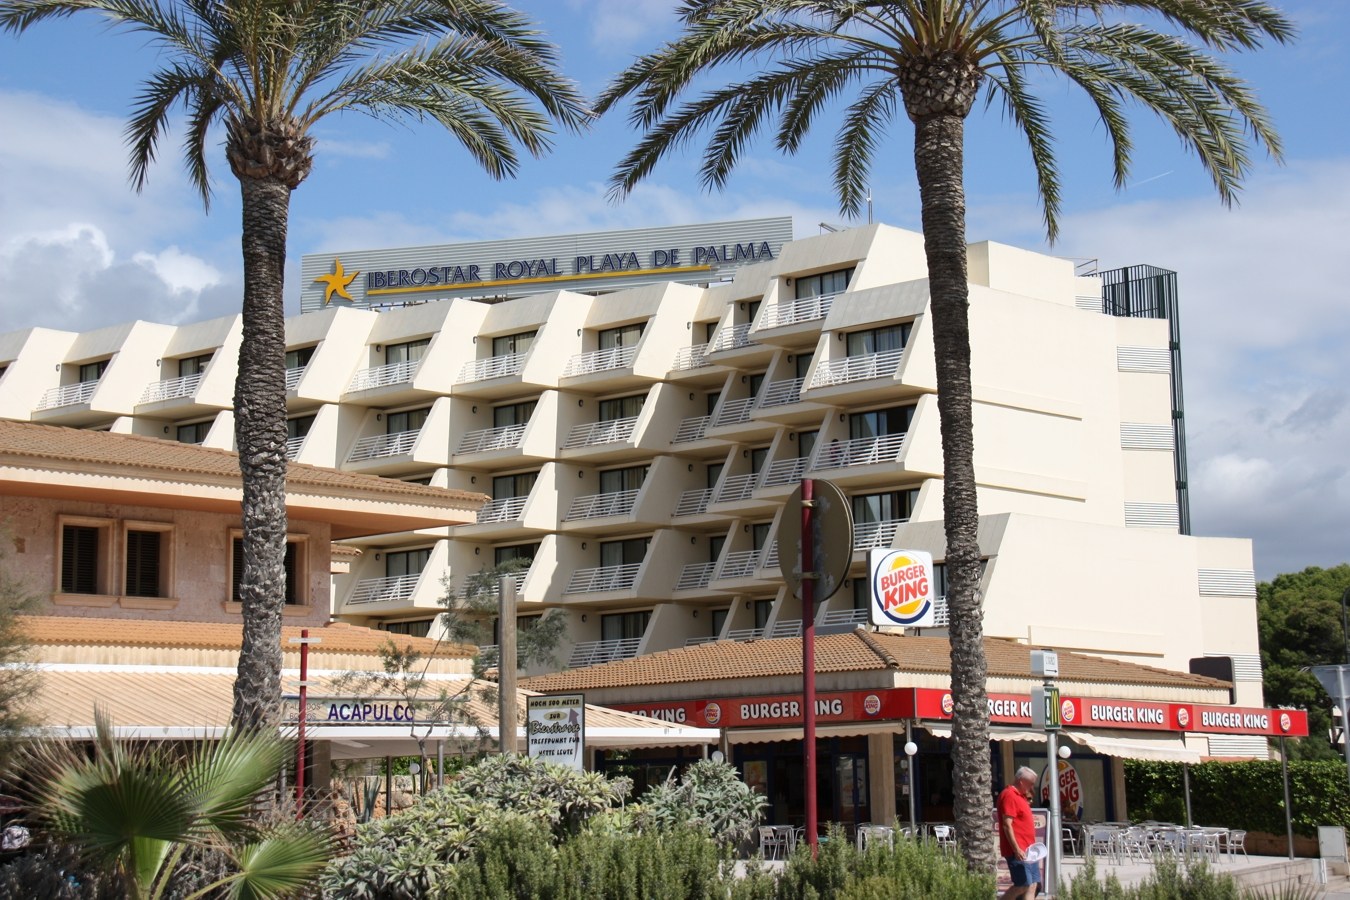 Hotel Iberostar Royal Playa de Palma vom Strand